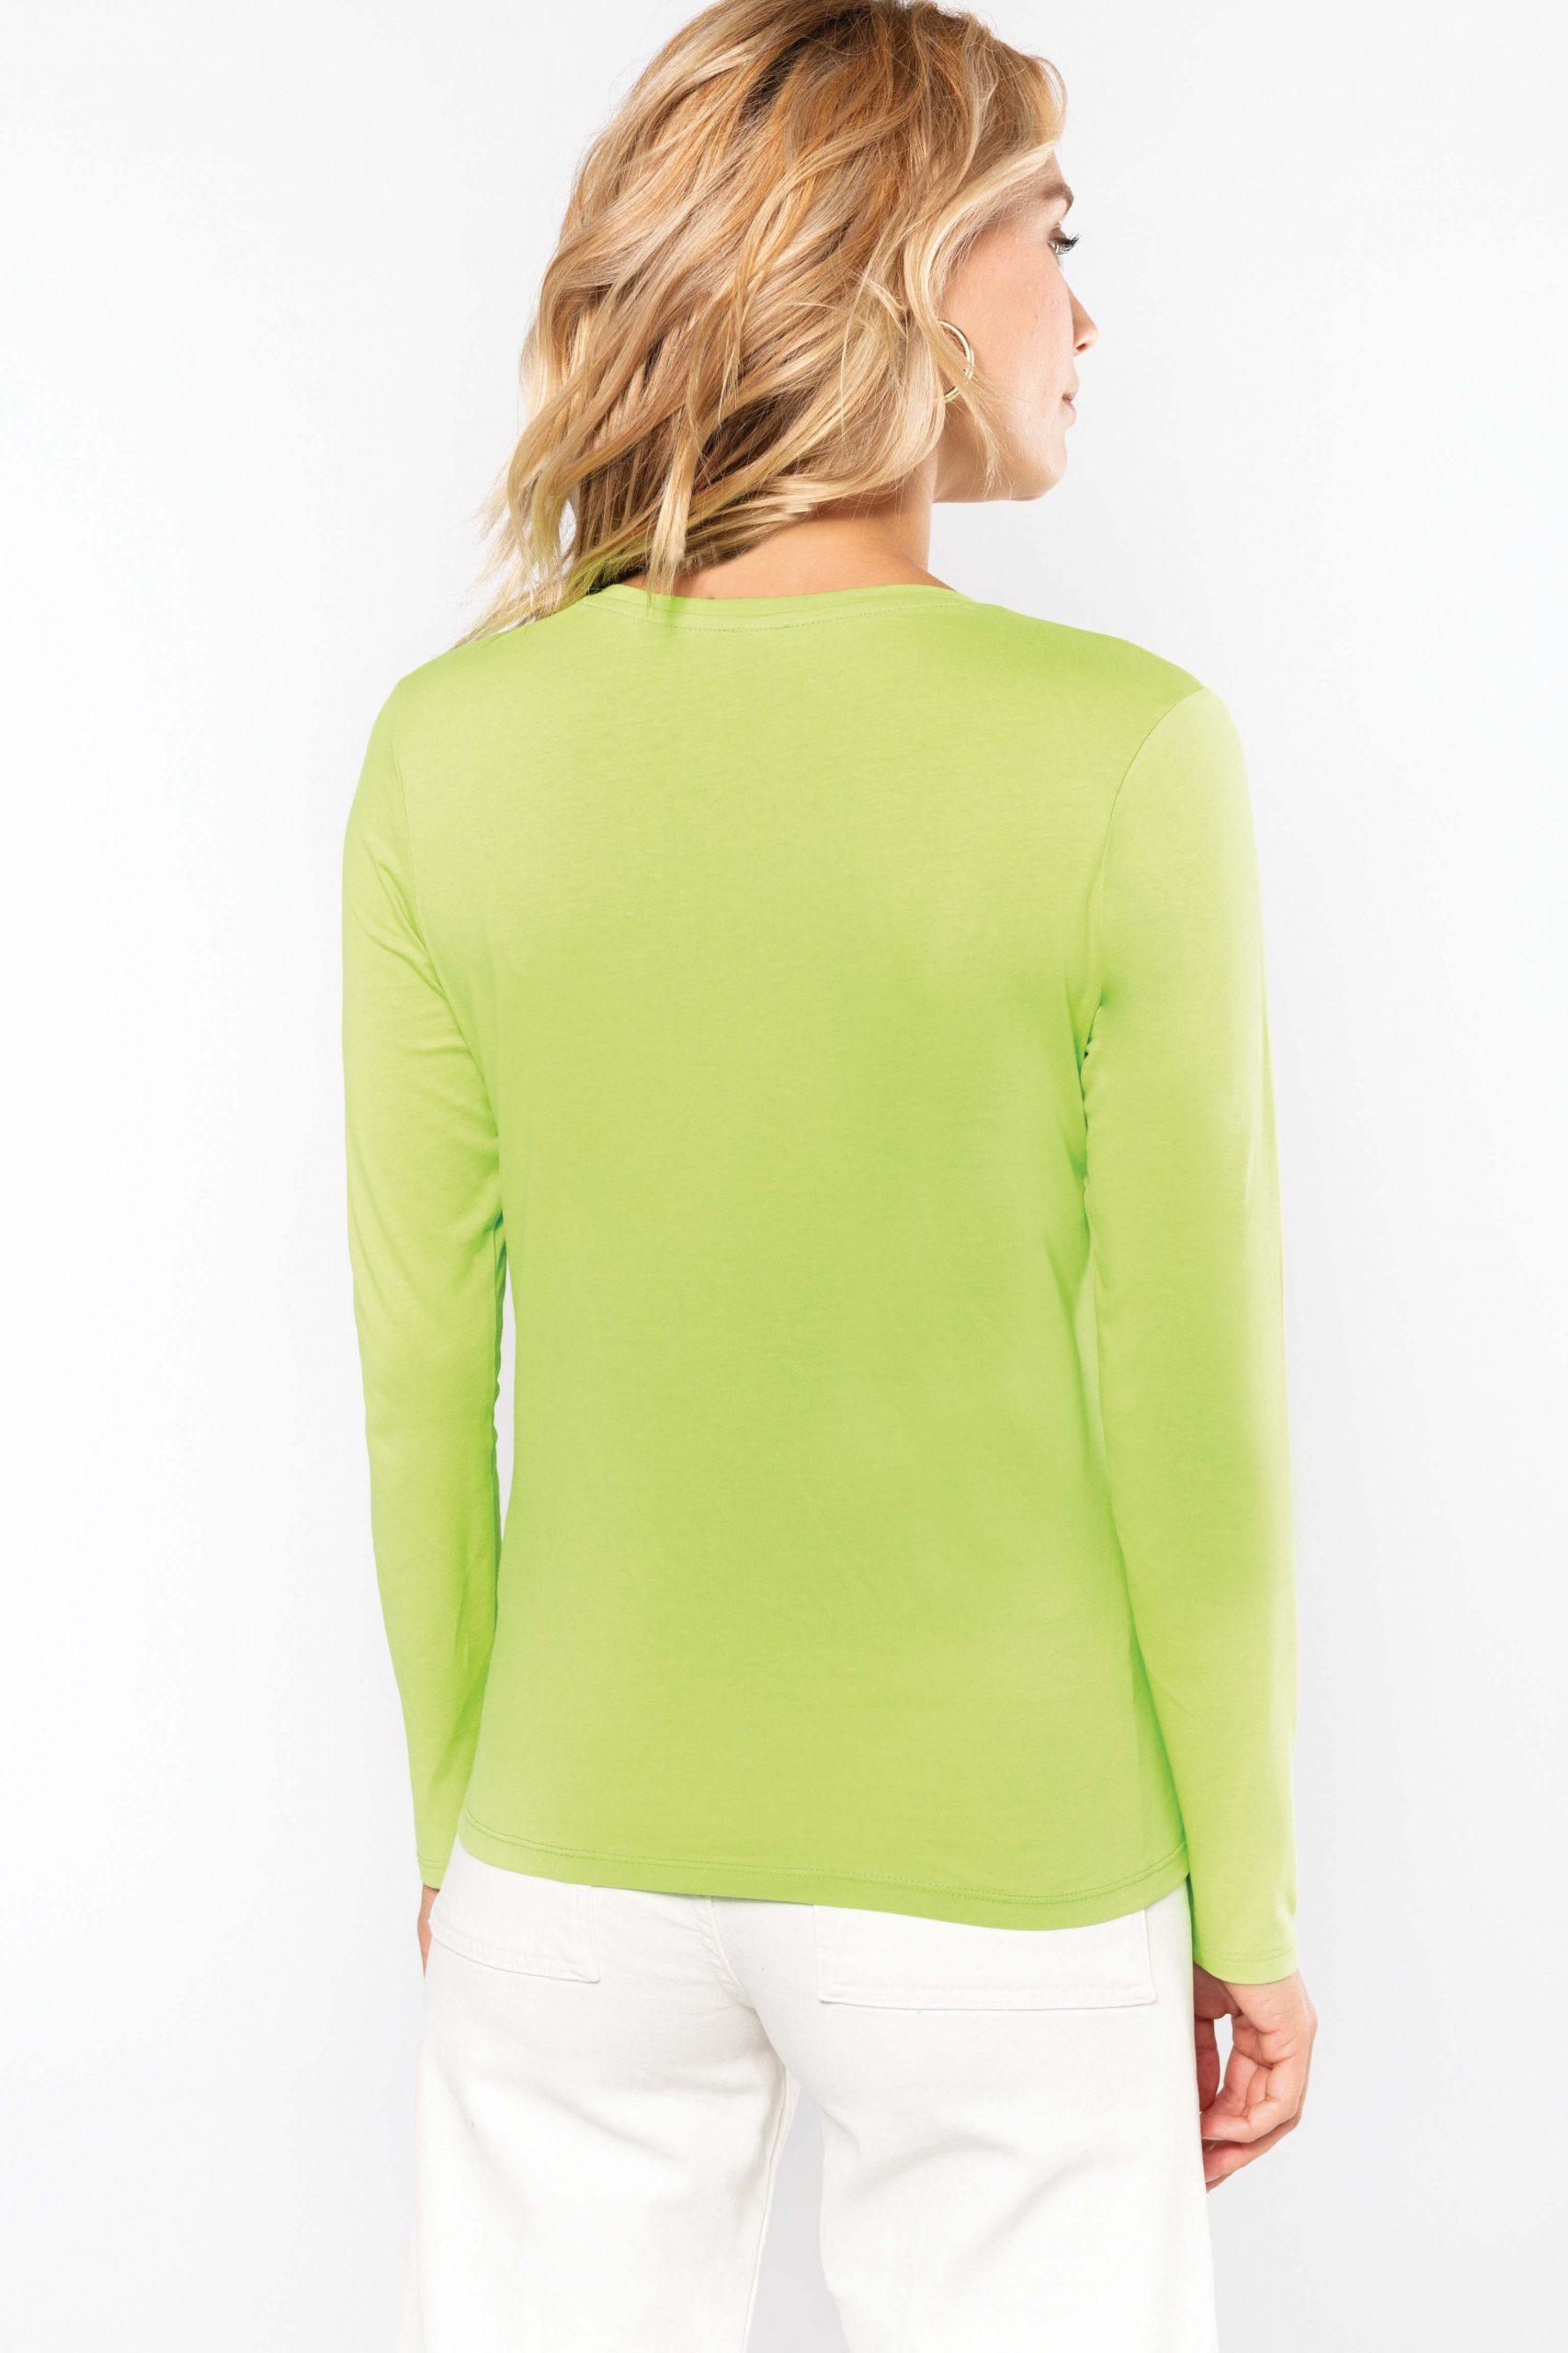 T-shirt Gekamd Enzymbehandeld Katoen V-hals Women